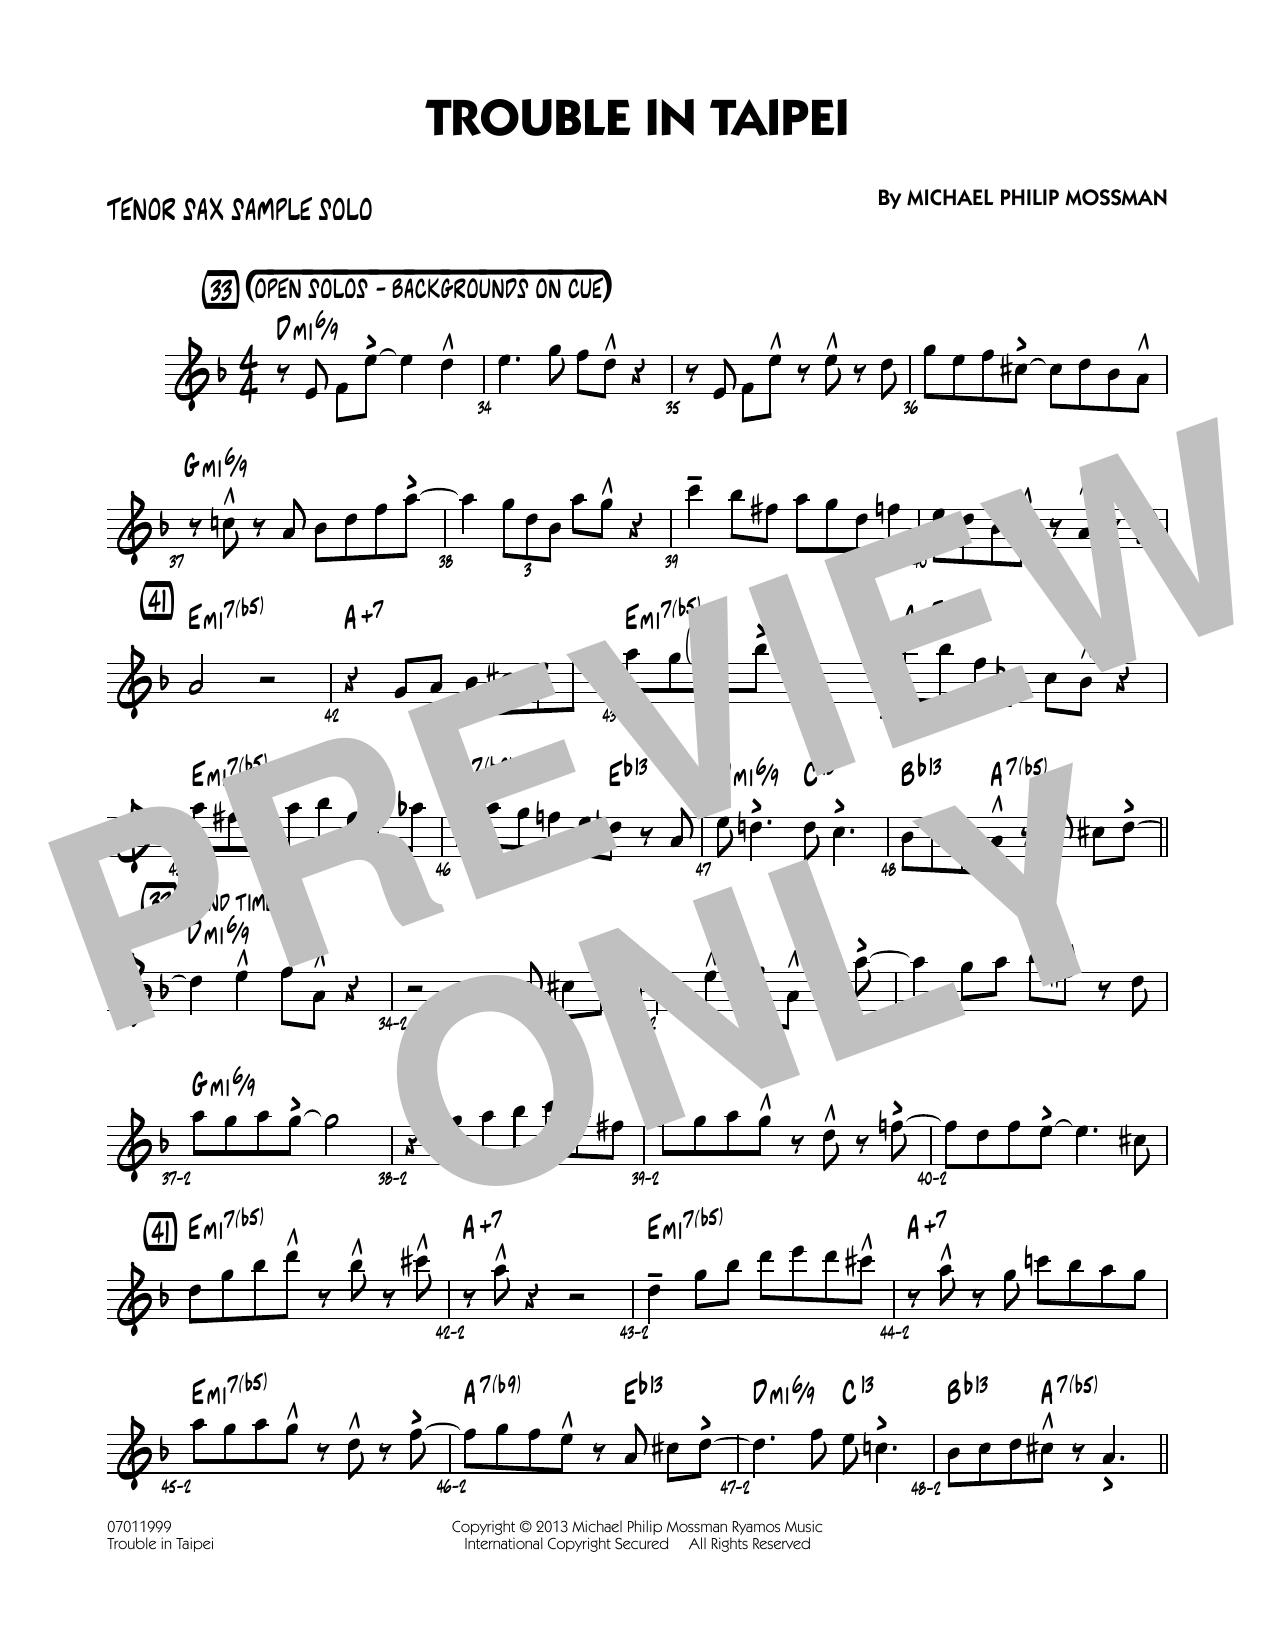 Trouble In Taipei - Tenor Sax Sample Solo Sheet Music